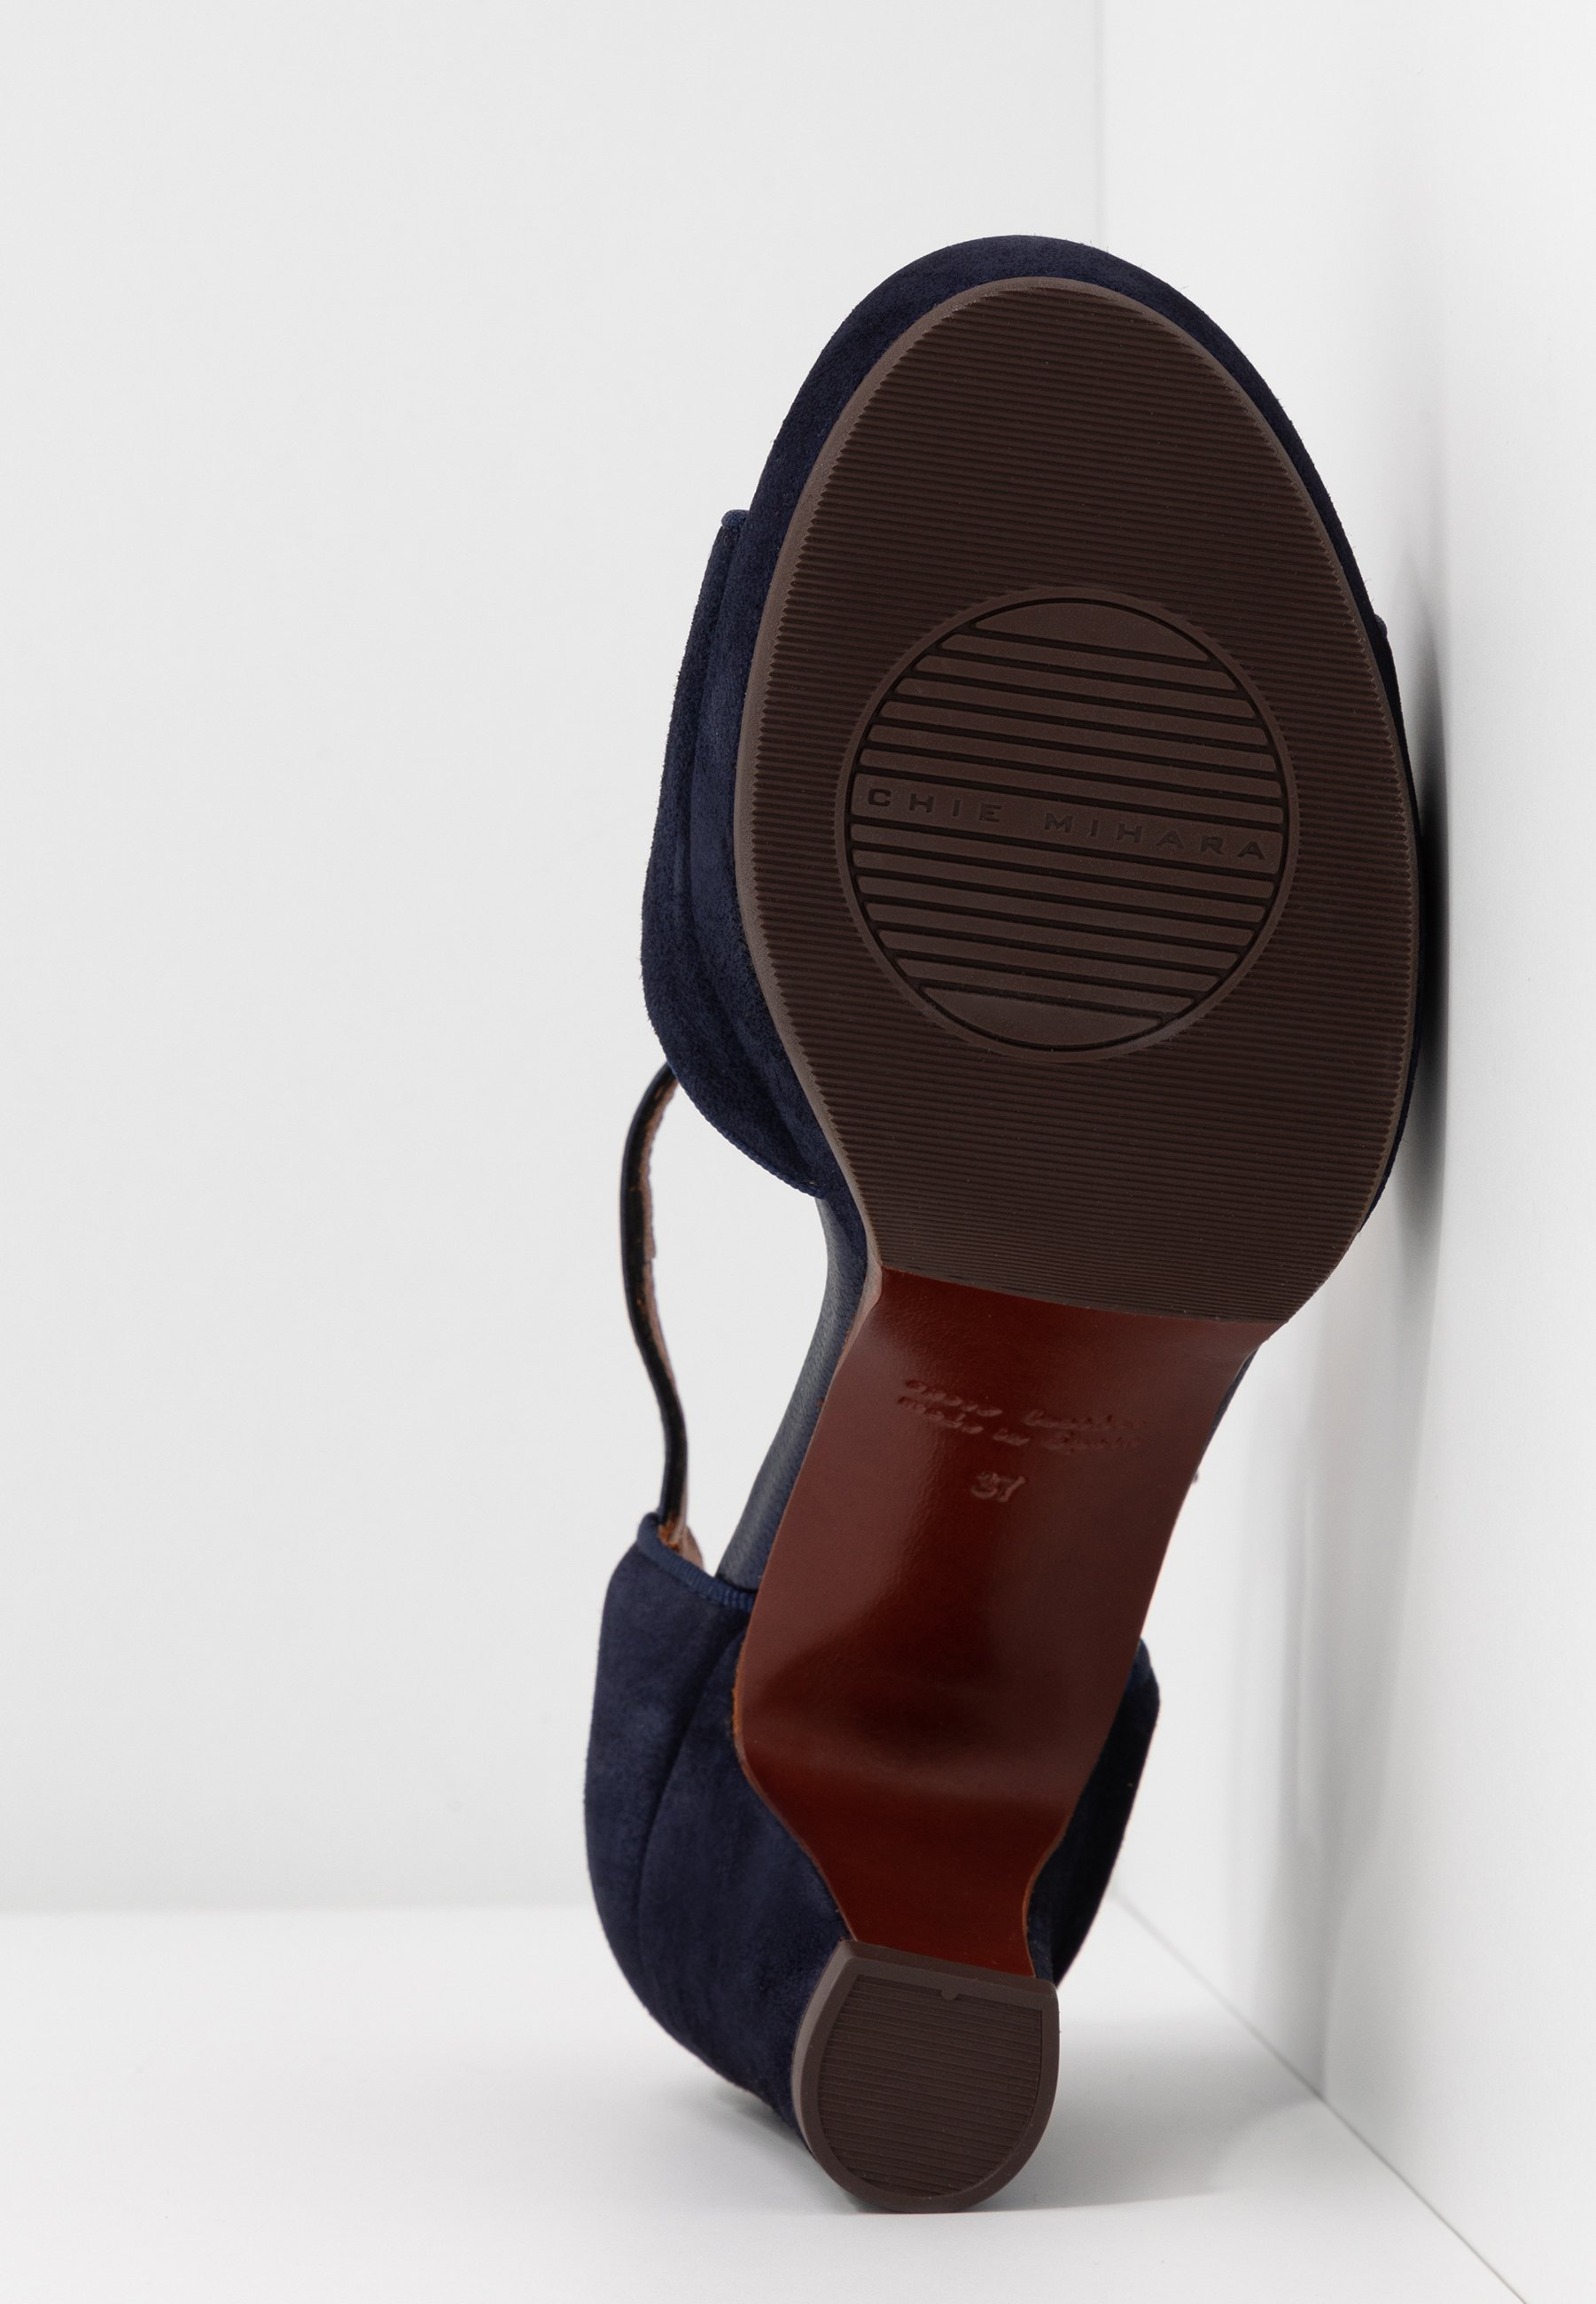 Chie Mihara Emus - Sandaletter Nuit/posh Navy